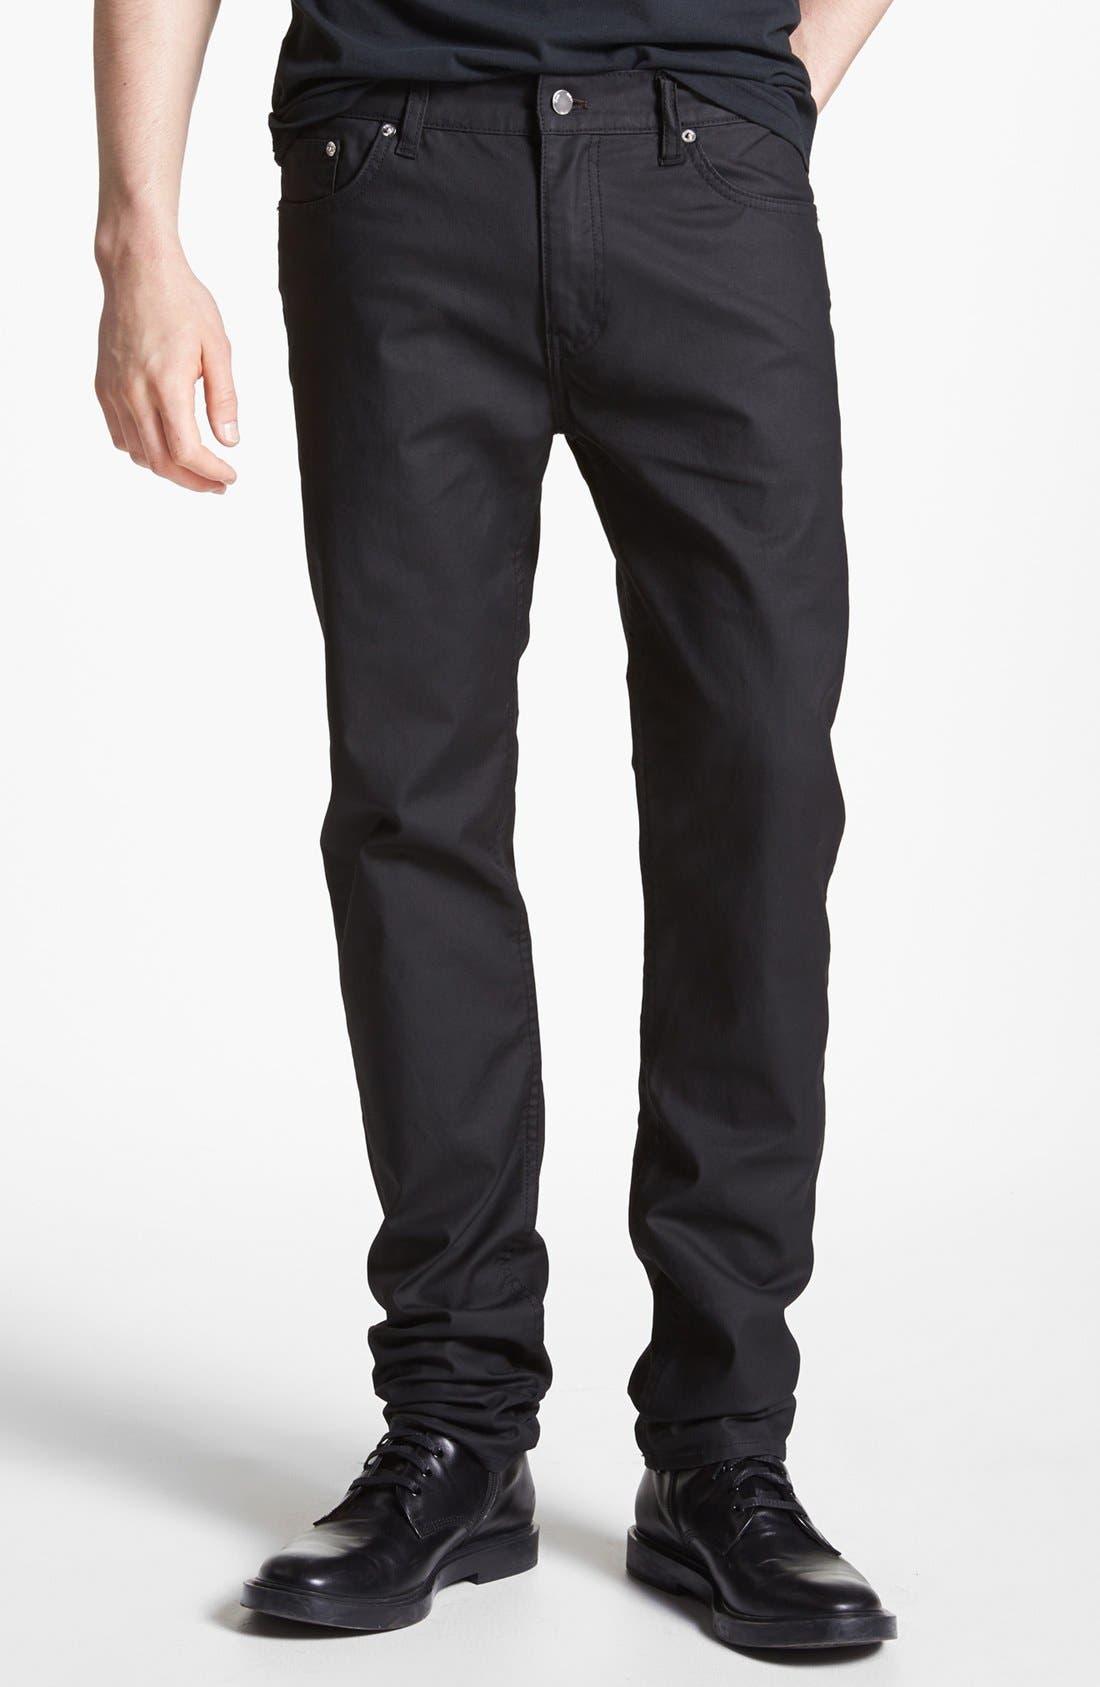 Alternate Image 1 Selected - BLK DNM 'Jeans 5' Slim Straight Leg Jeans (Orchard Black)